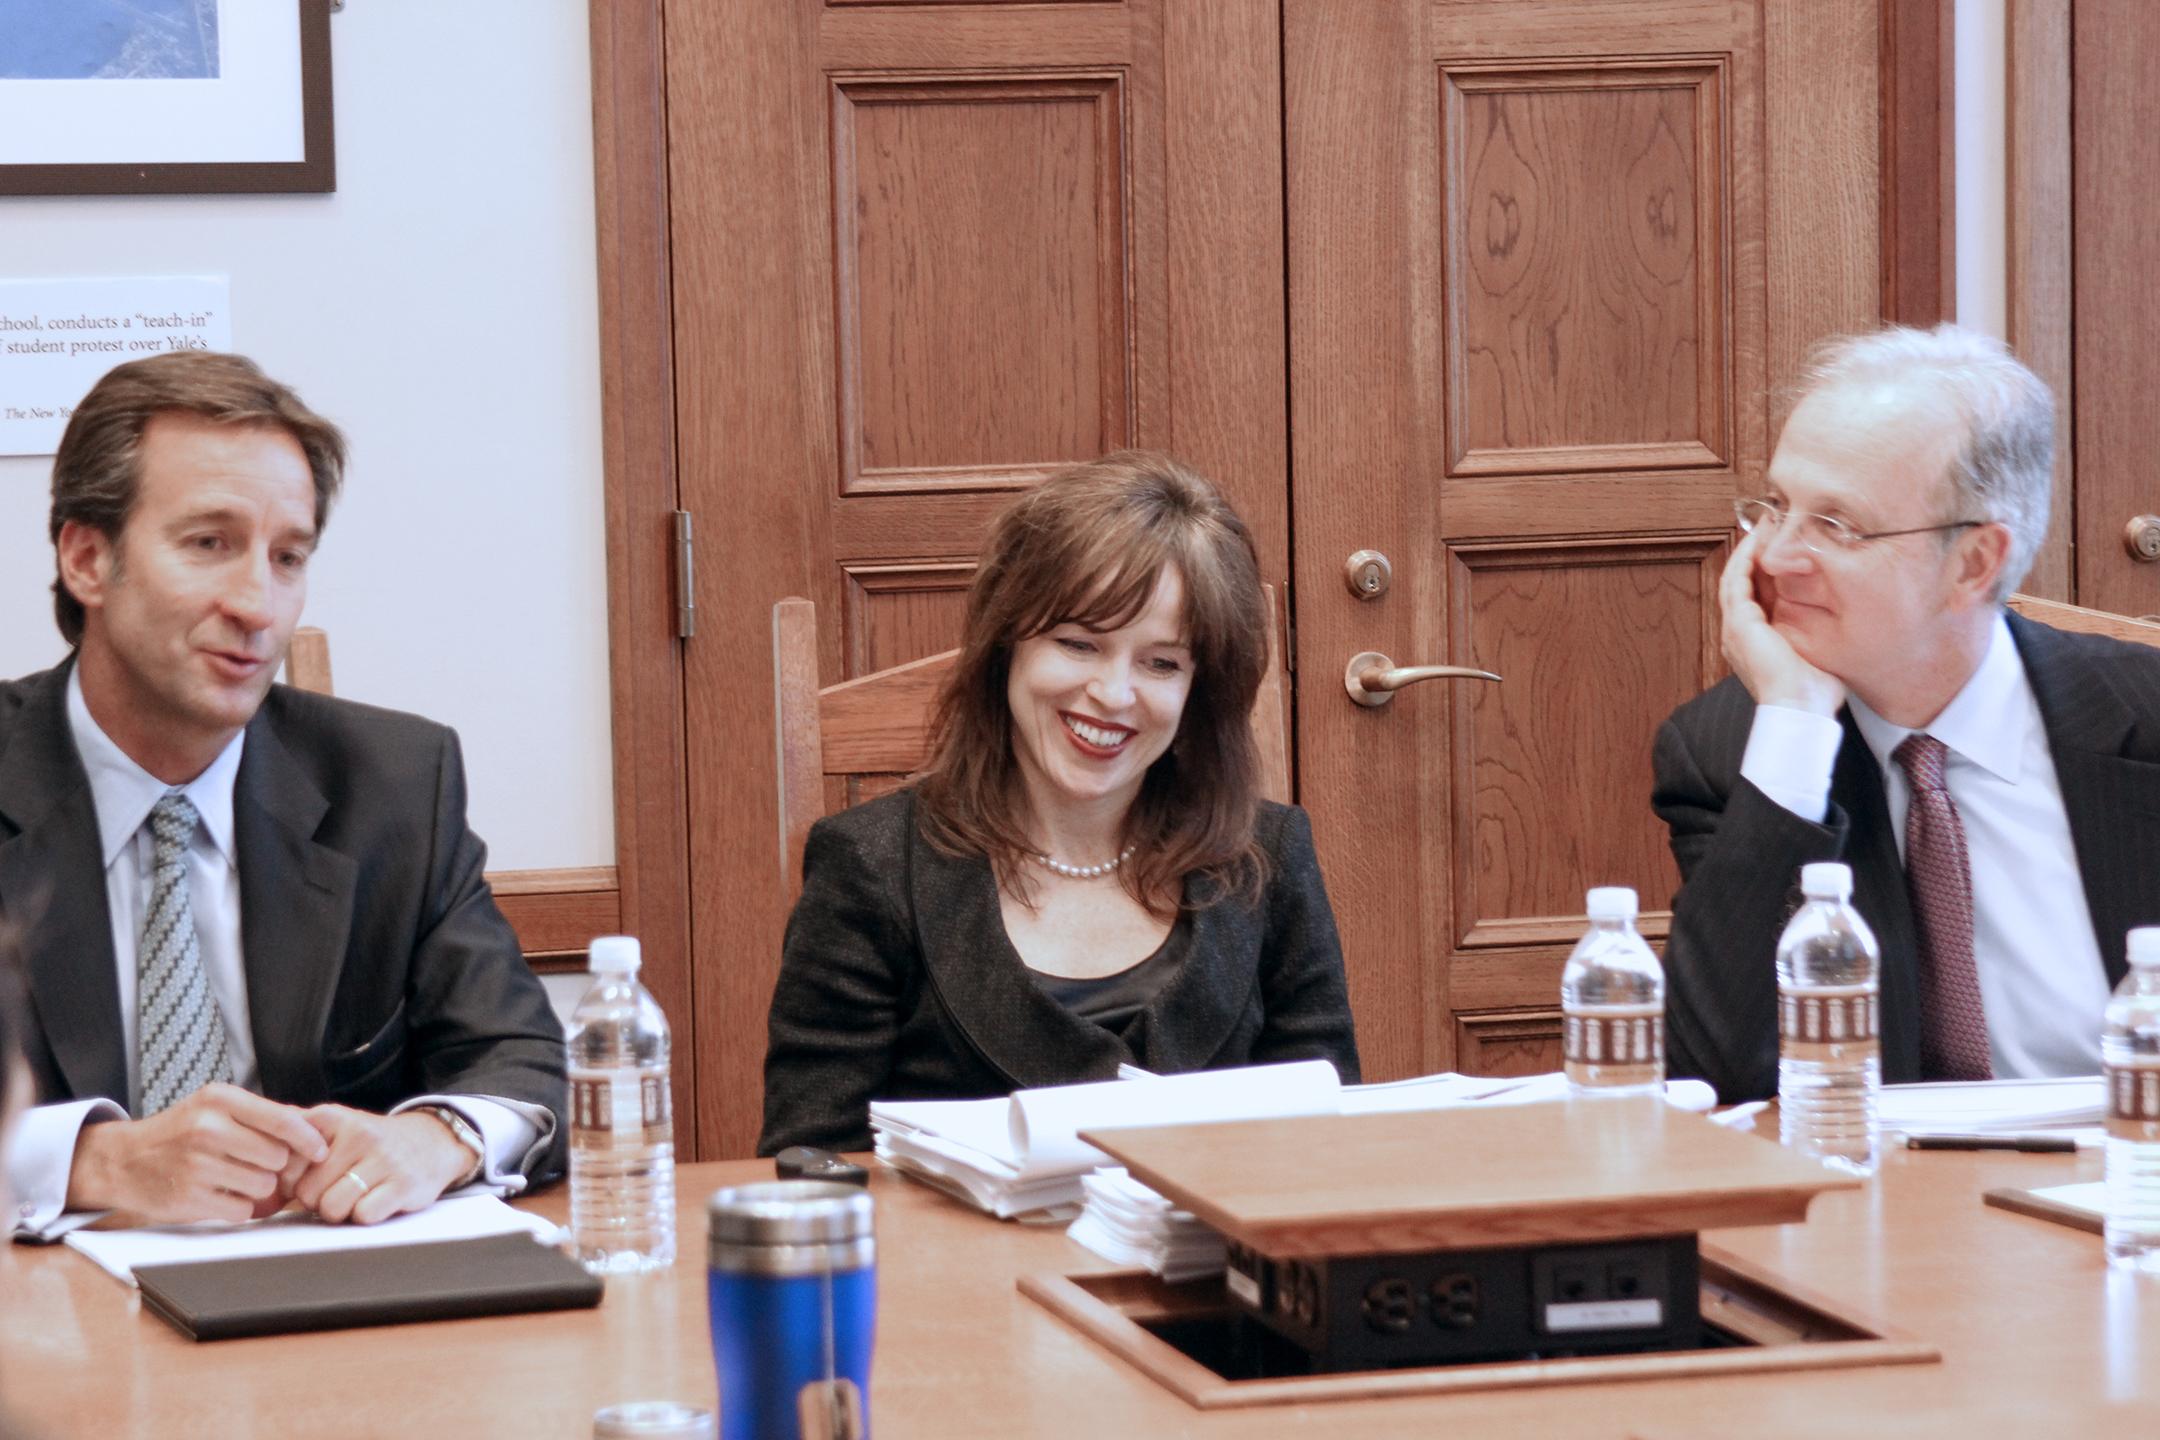 Alvaro Barriga, Lynn K. Neuner '92, and David Williams